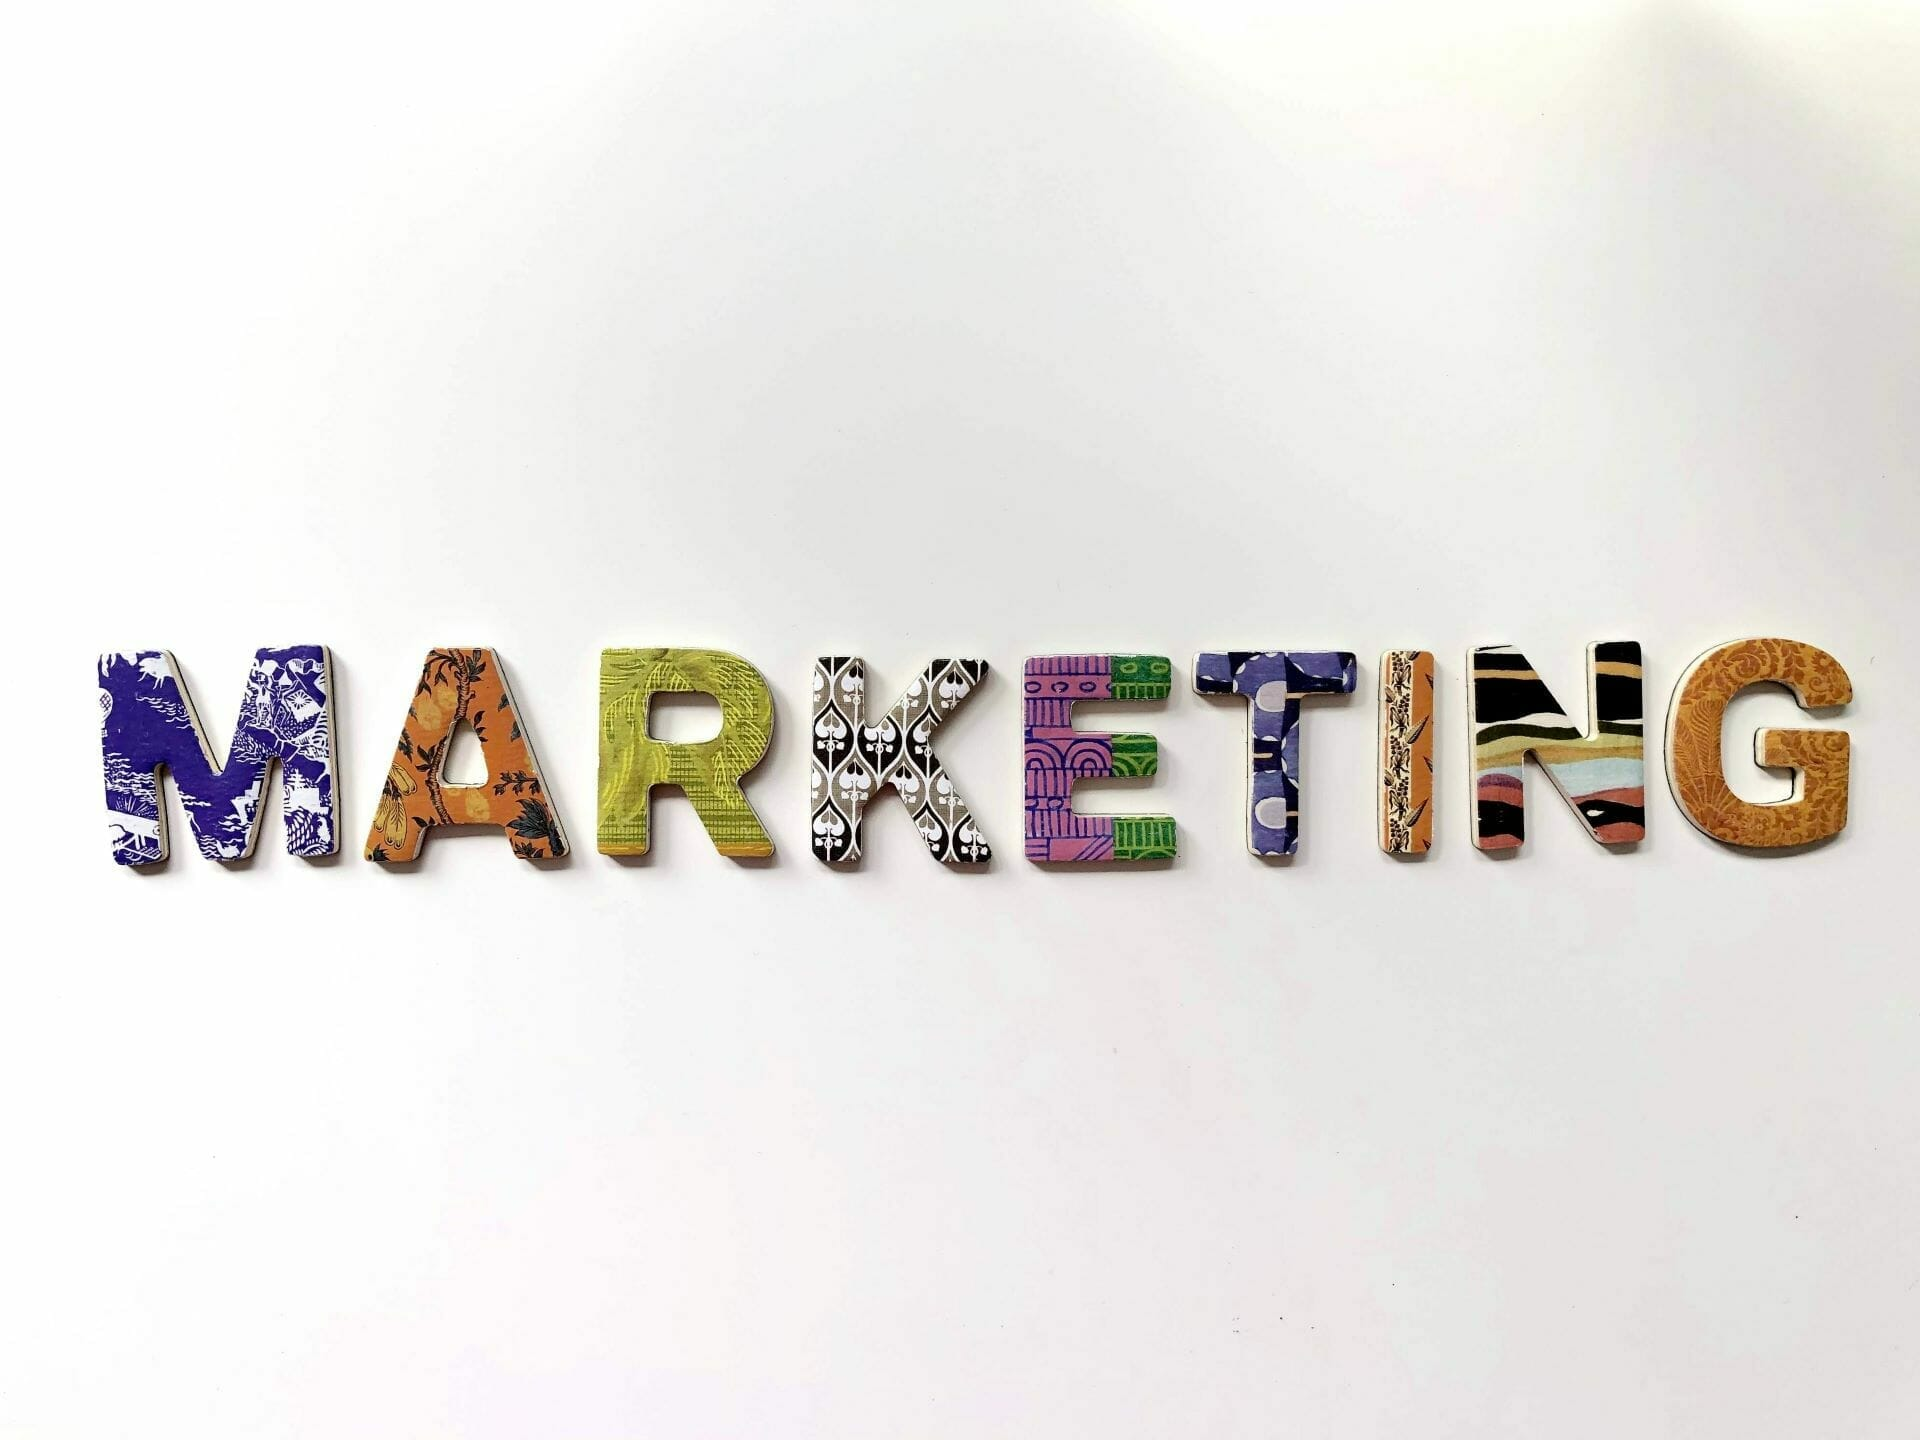 How to Avoid Multi Level Marketing Scams: Must-Read Guide via @allamericanatlas